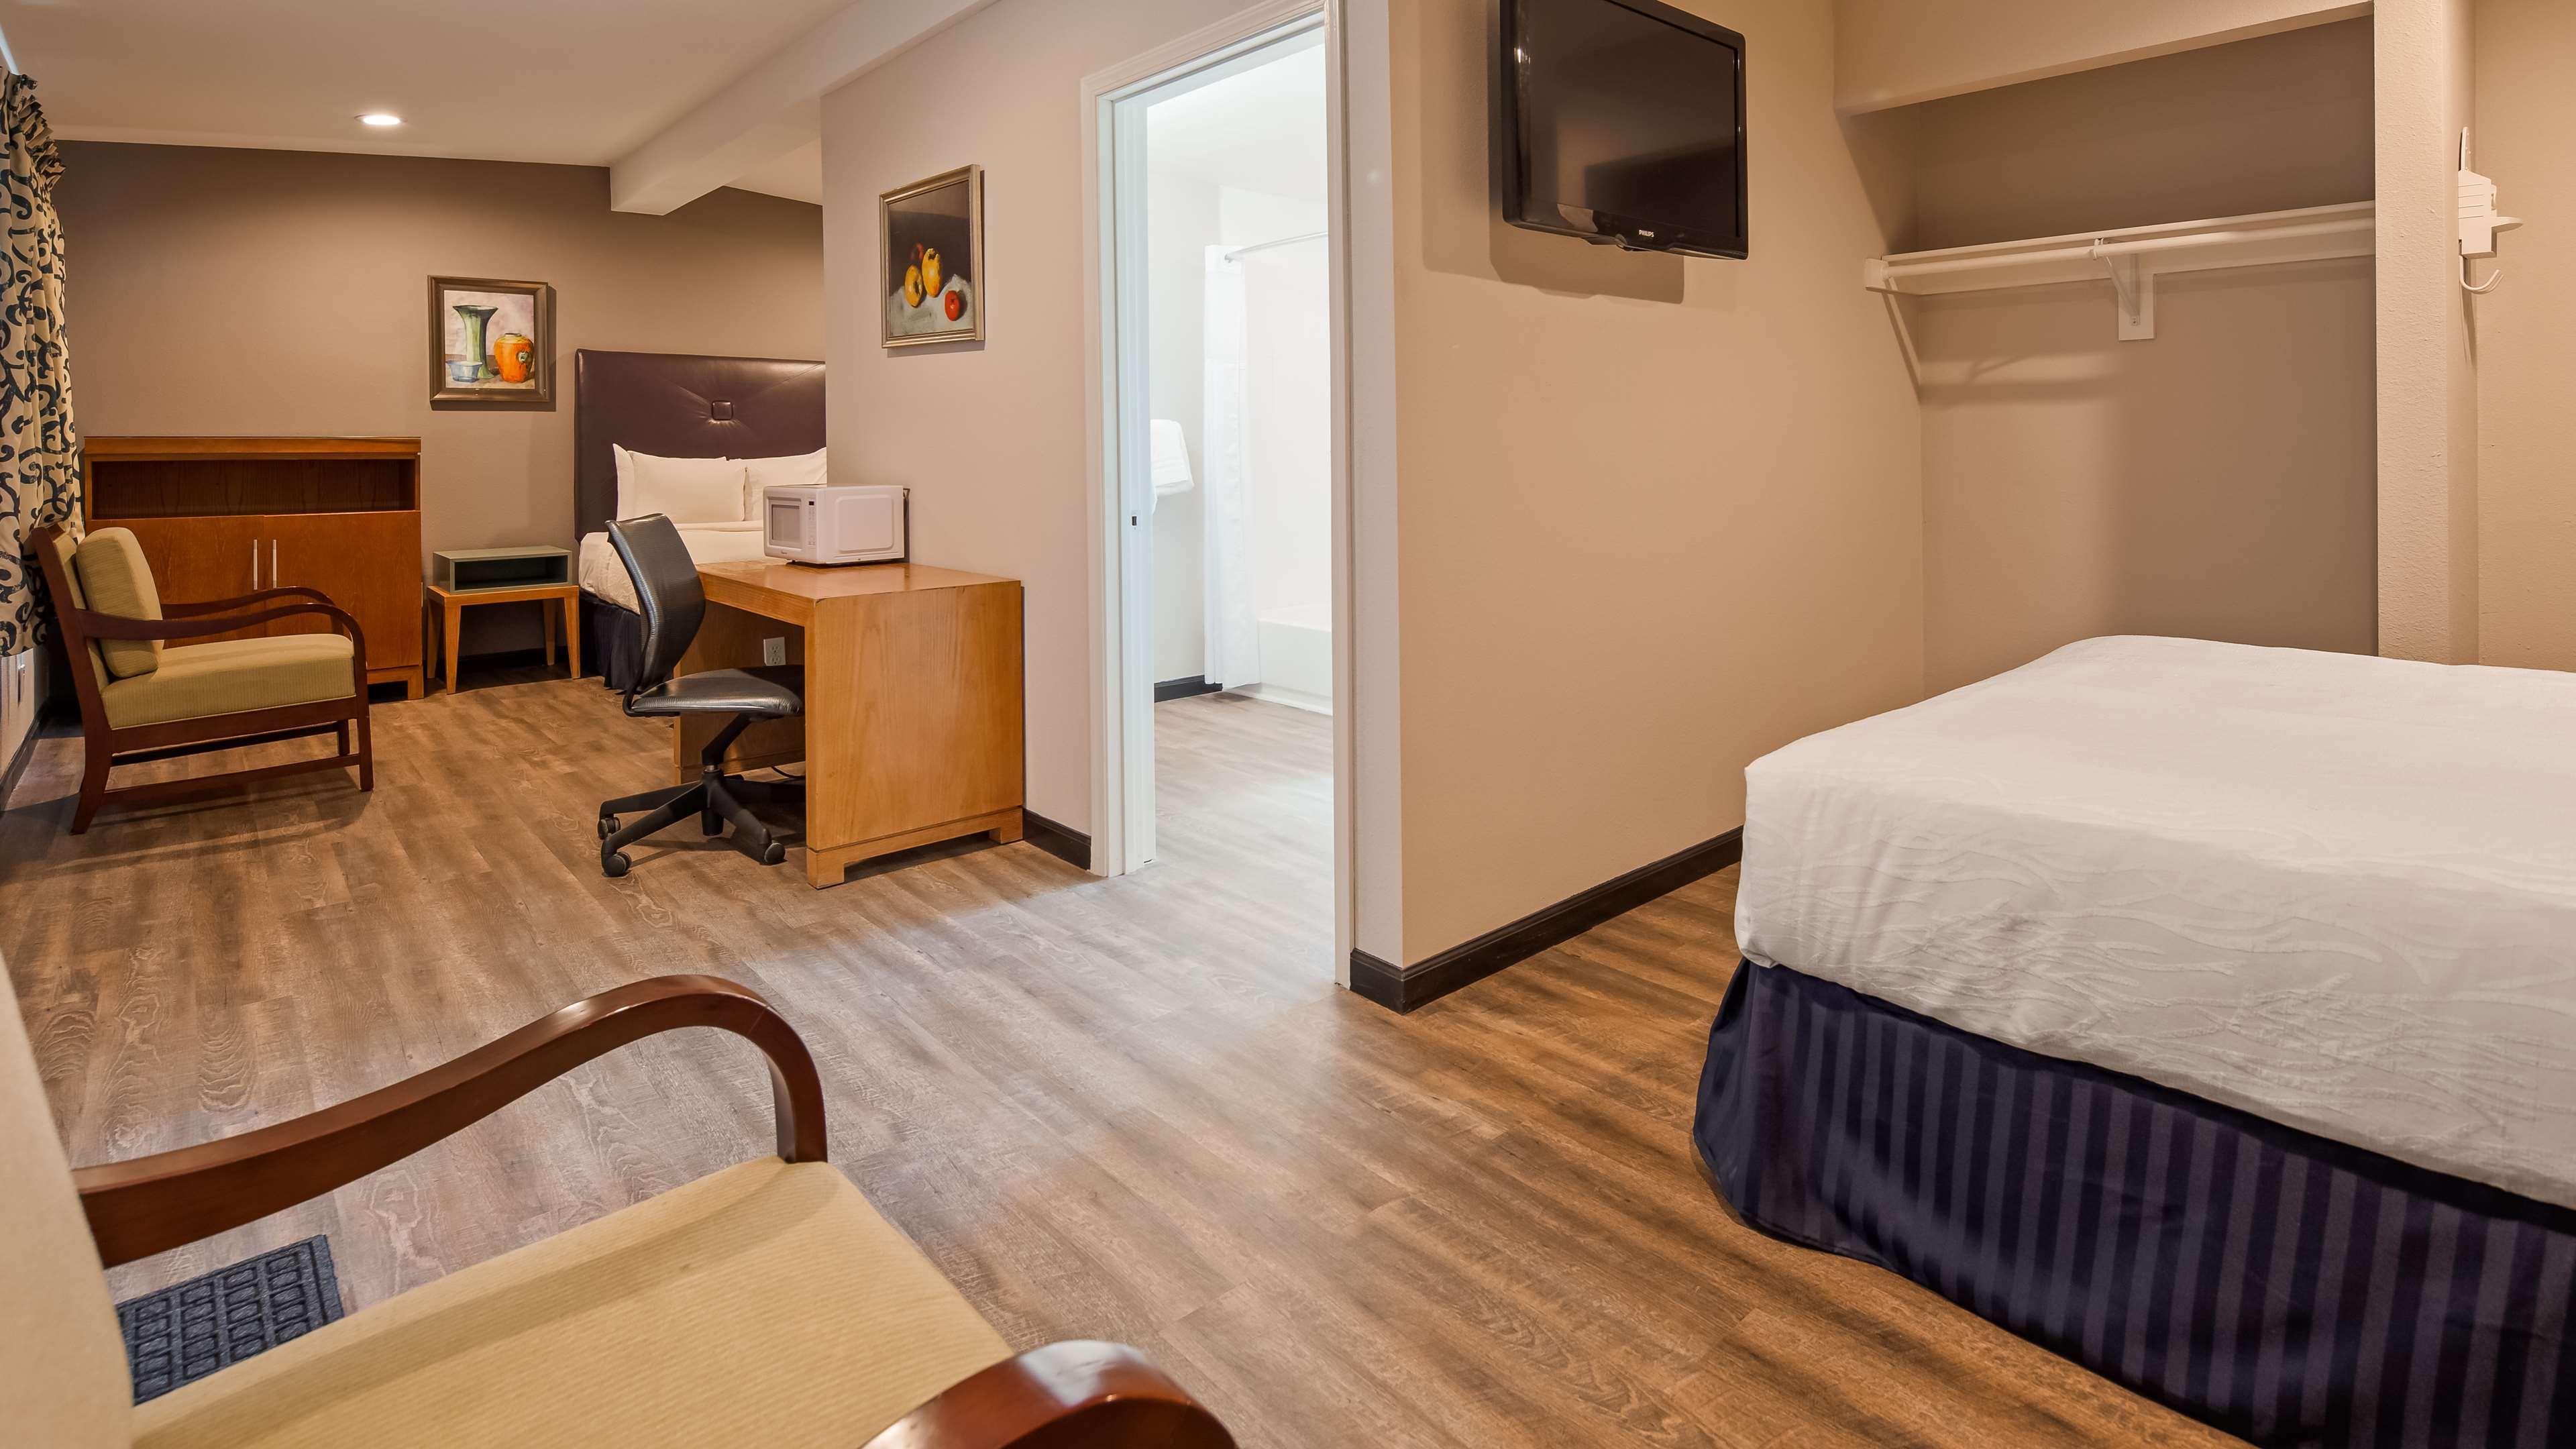 SureStay Hotel by Best Western Ridgecrest image 6